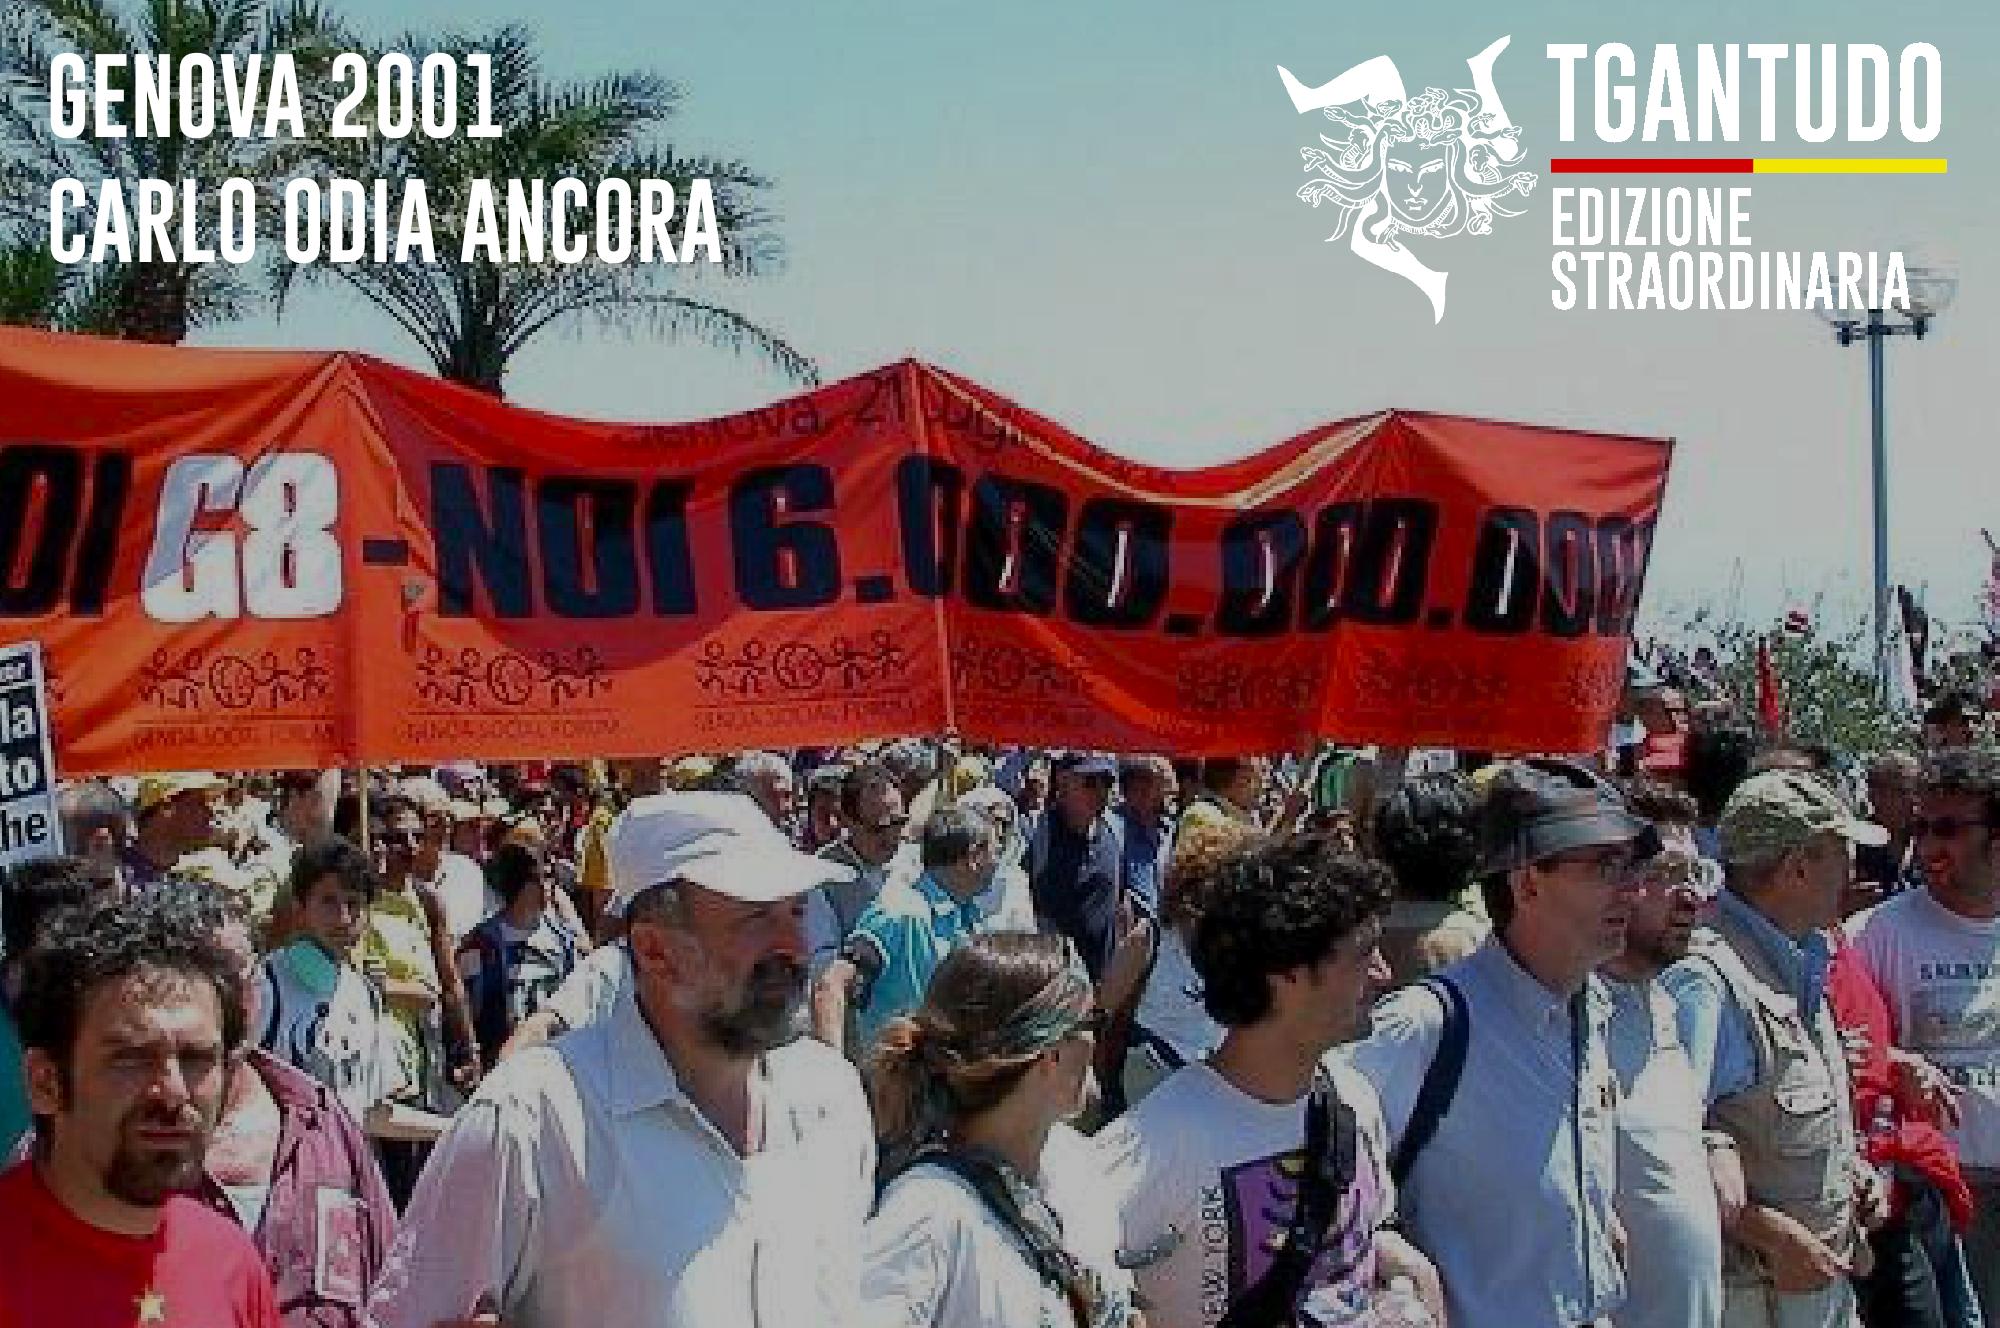 TGAntudo – Genova 2001. Carlo odia ancora